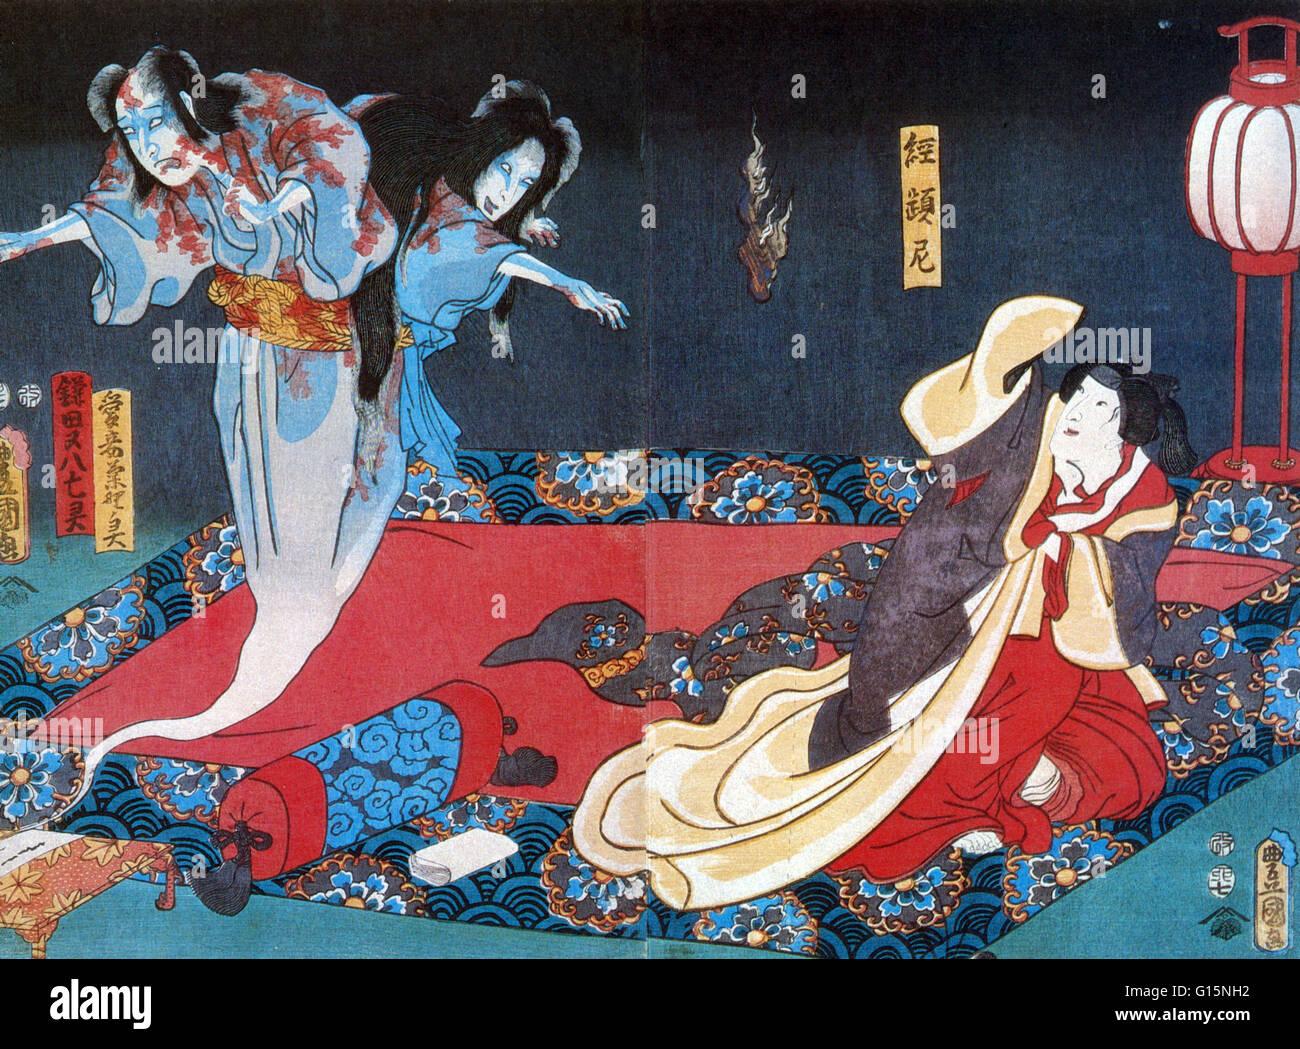 Detail of 'The Ghosts of Matahachi and Kikuno' by Utagawa Kunisada. Yurei are figures in Japanese folklore, - Stock Image